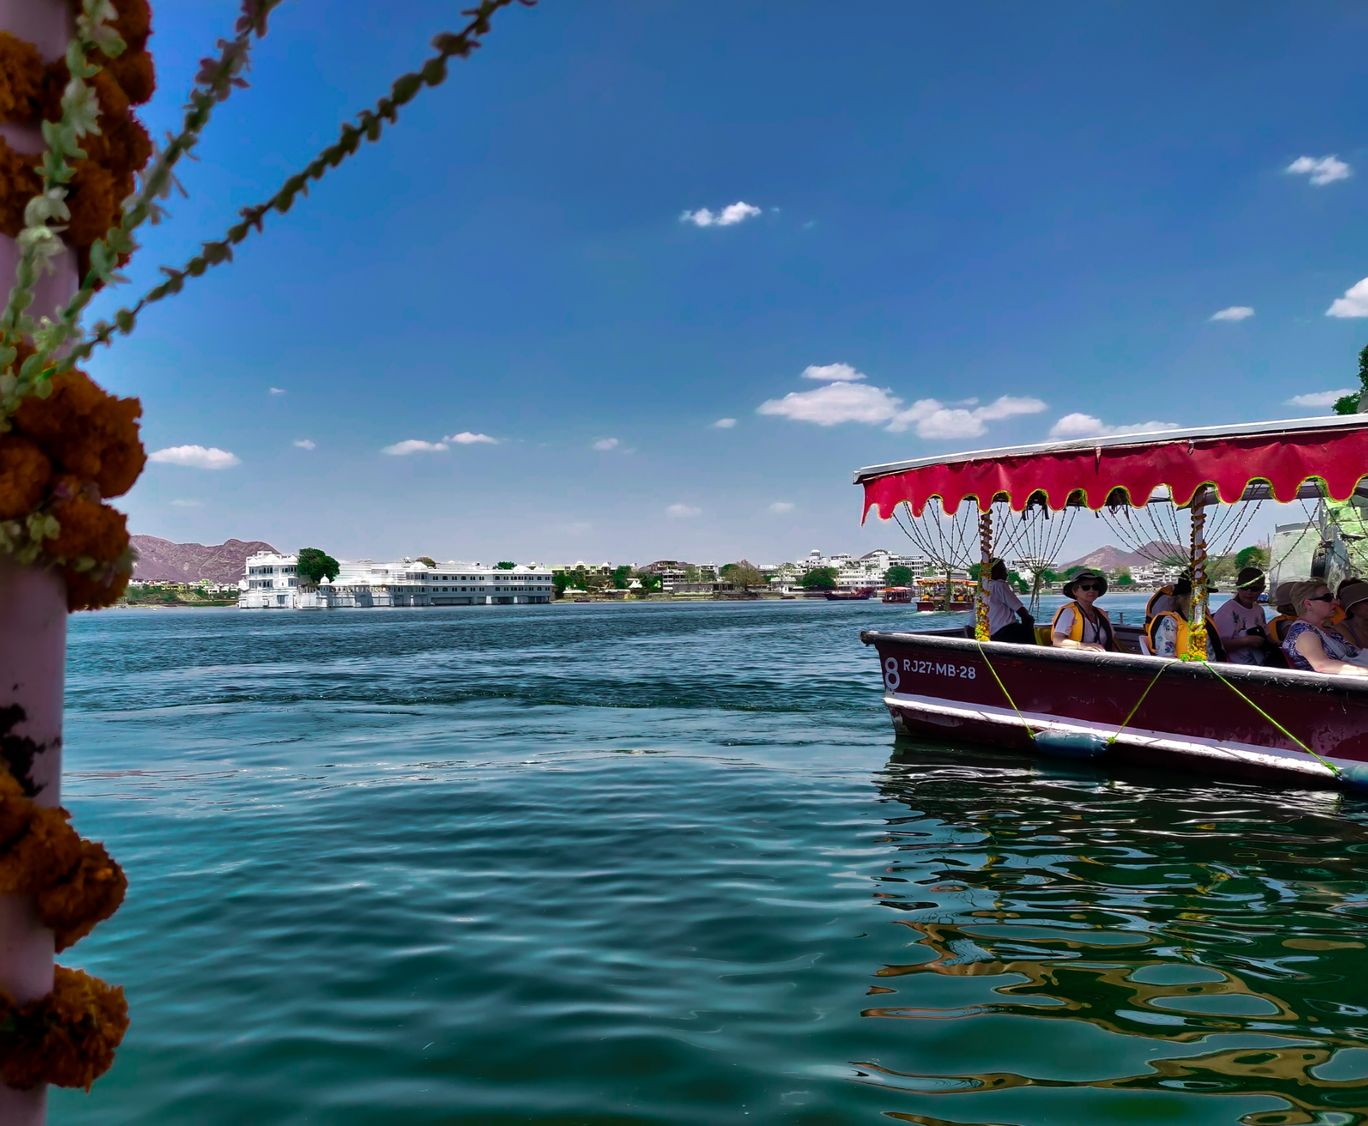 Photo of Rajasthan By Vidushi Sharma